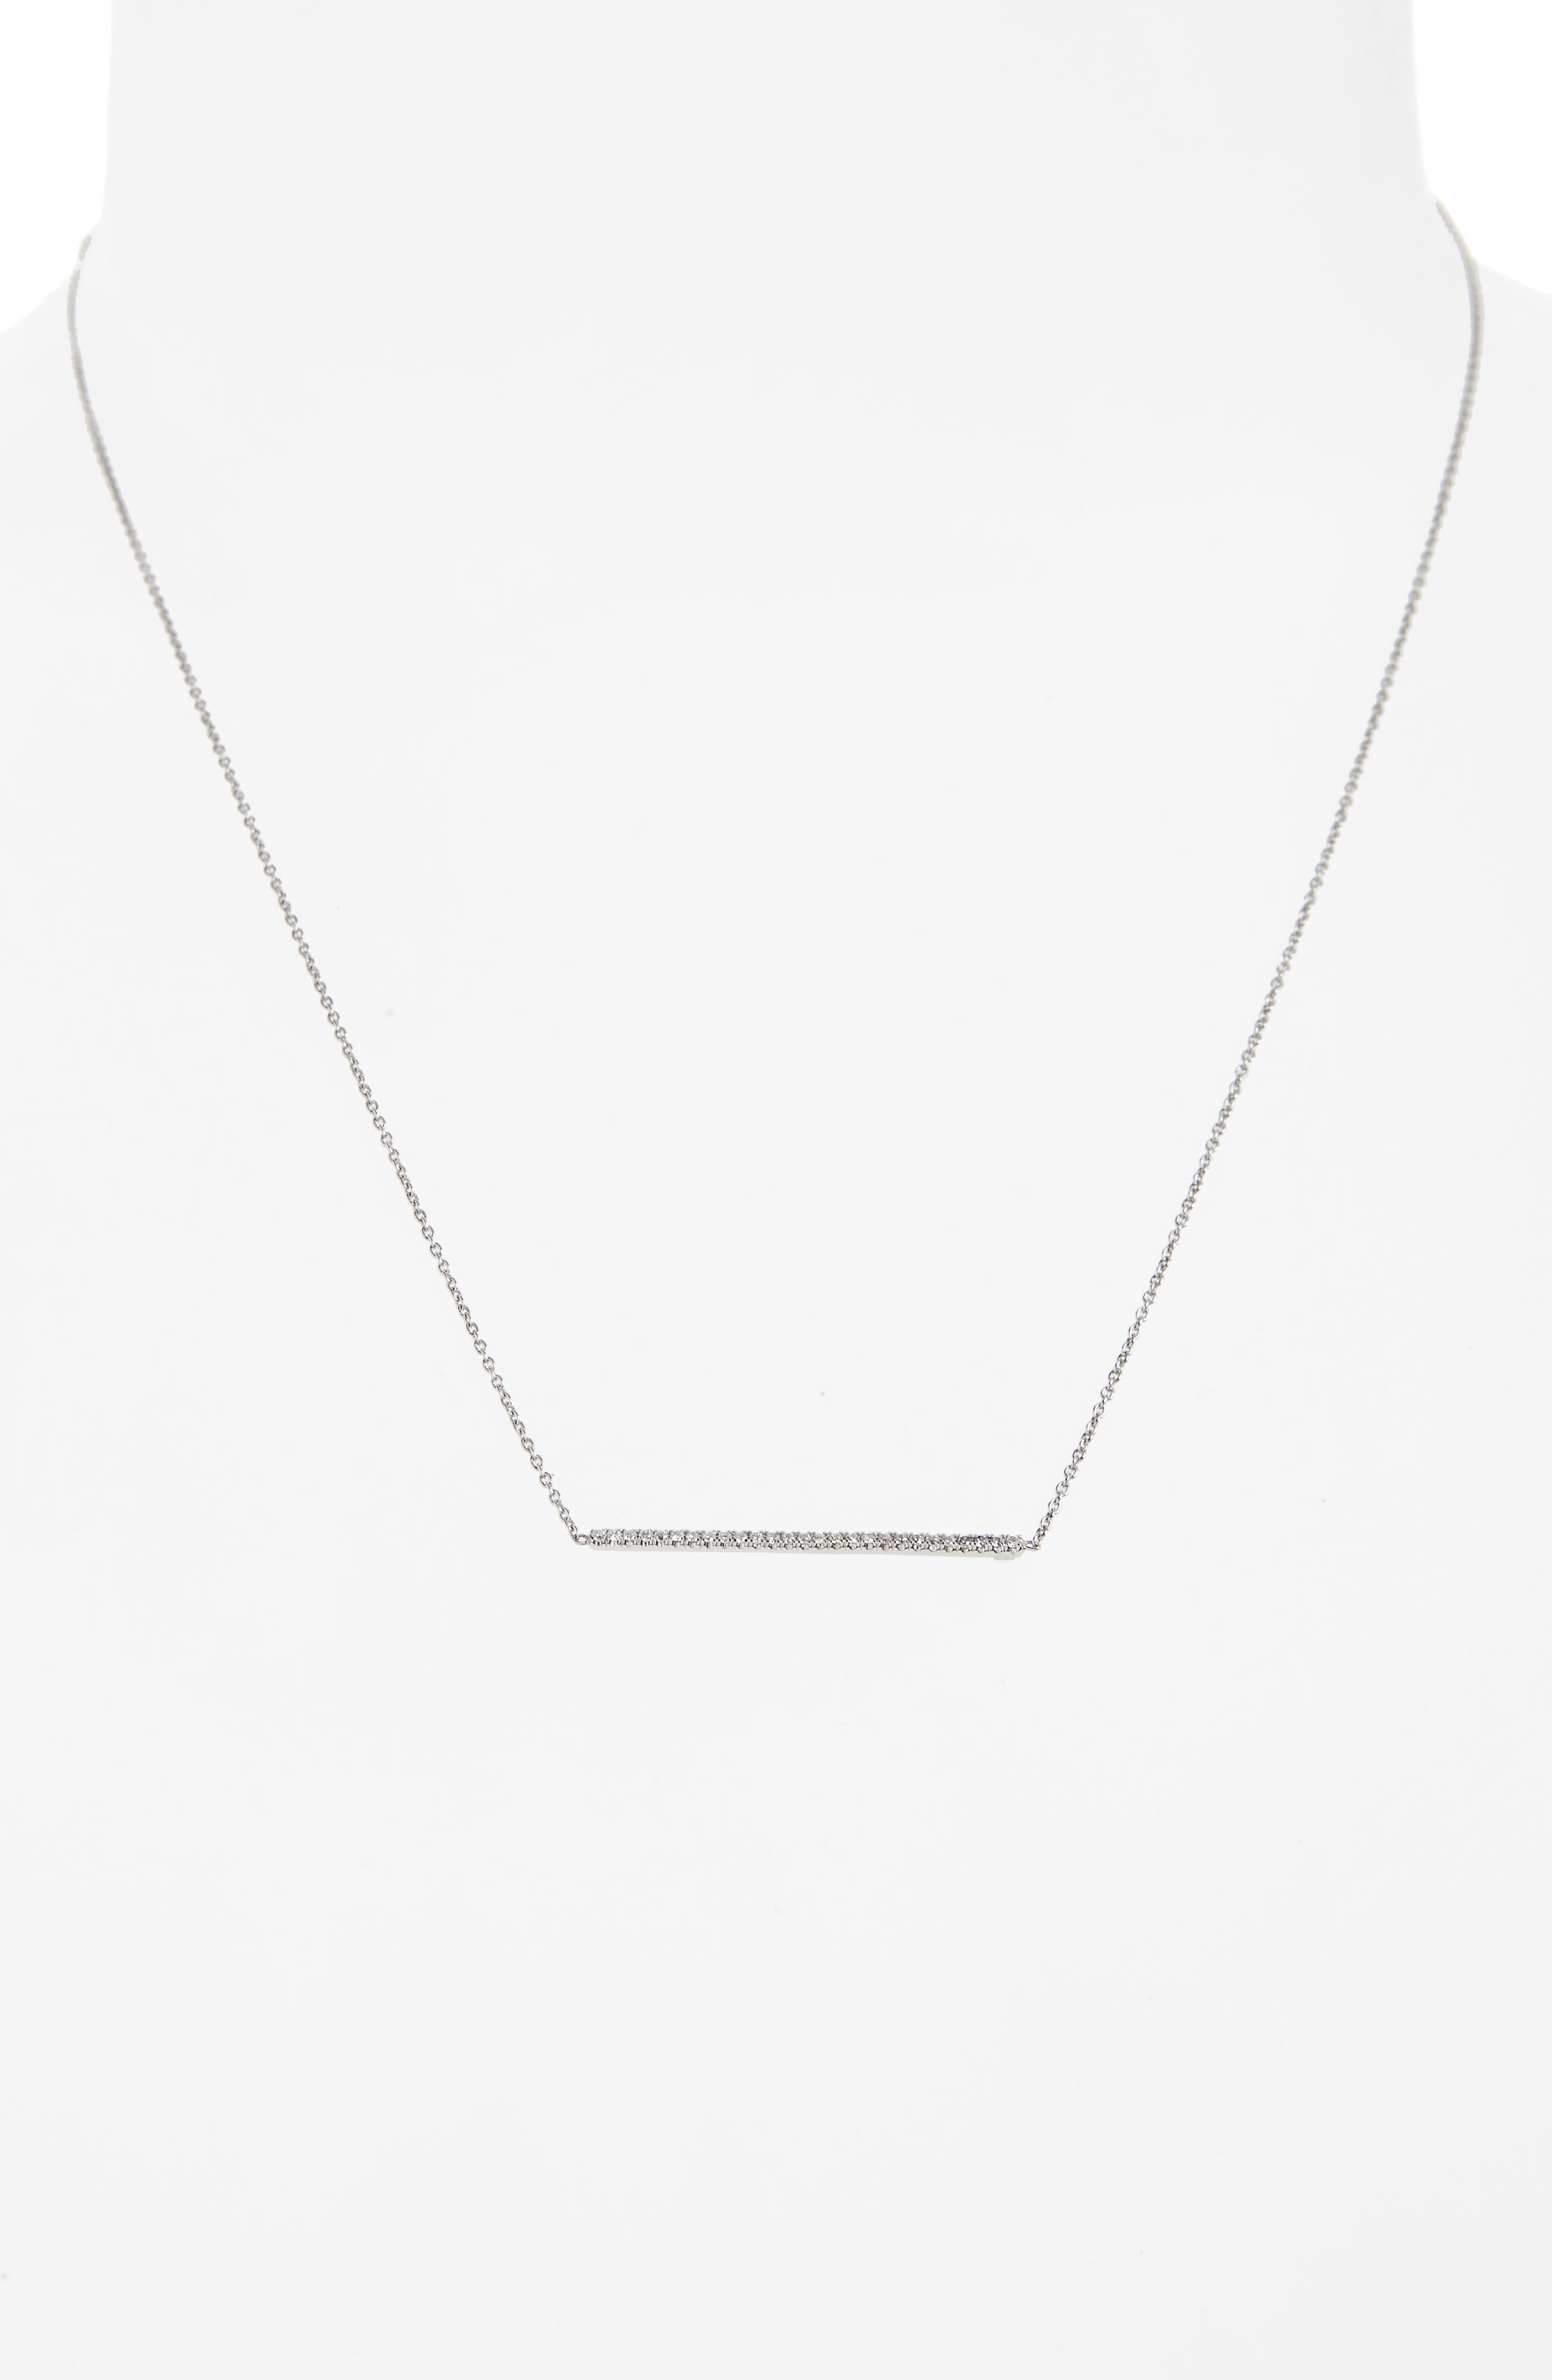 Tiny Treasures Diamond Bar Necklace,                             Alternate thumbnail 2, color,                             WHITE GOLD